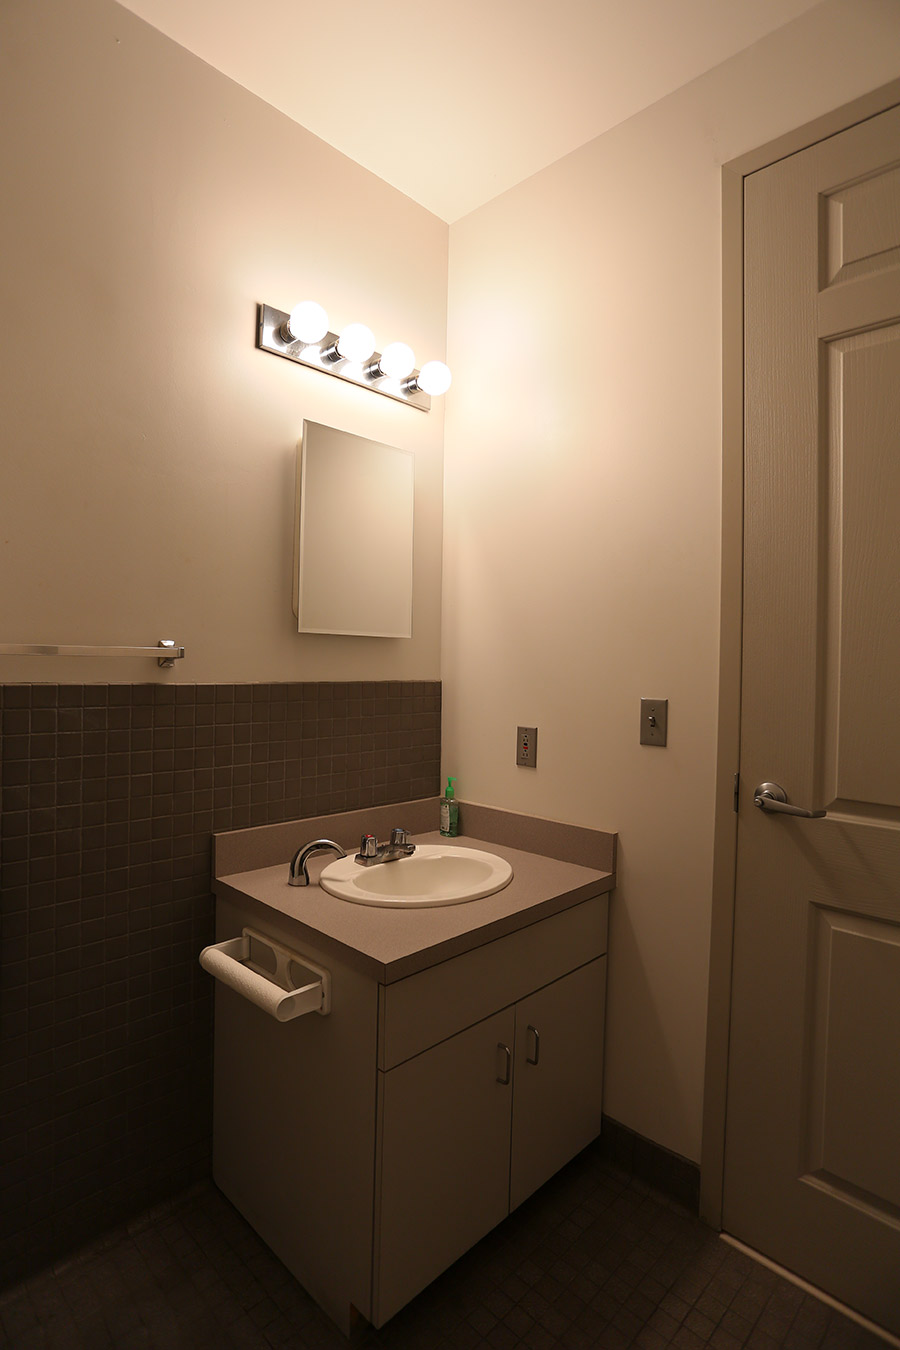 Vanity Lights Wattage : G30 LED Vanity Bulb w/ High CRI - 45 Watt Equivalent - Dimmable - 450 Lumens LED Globe Bulbs ...